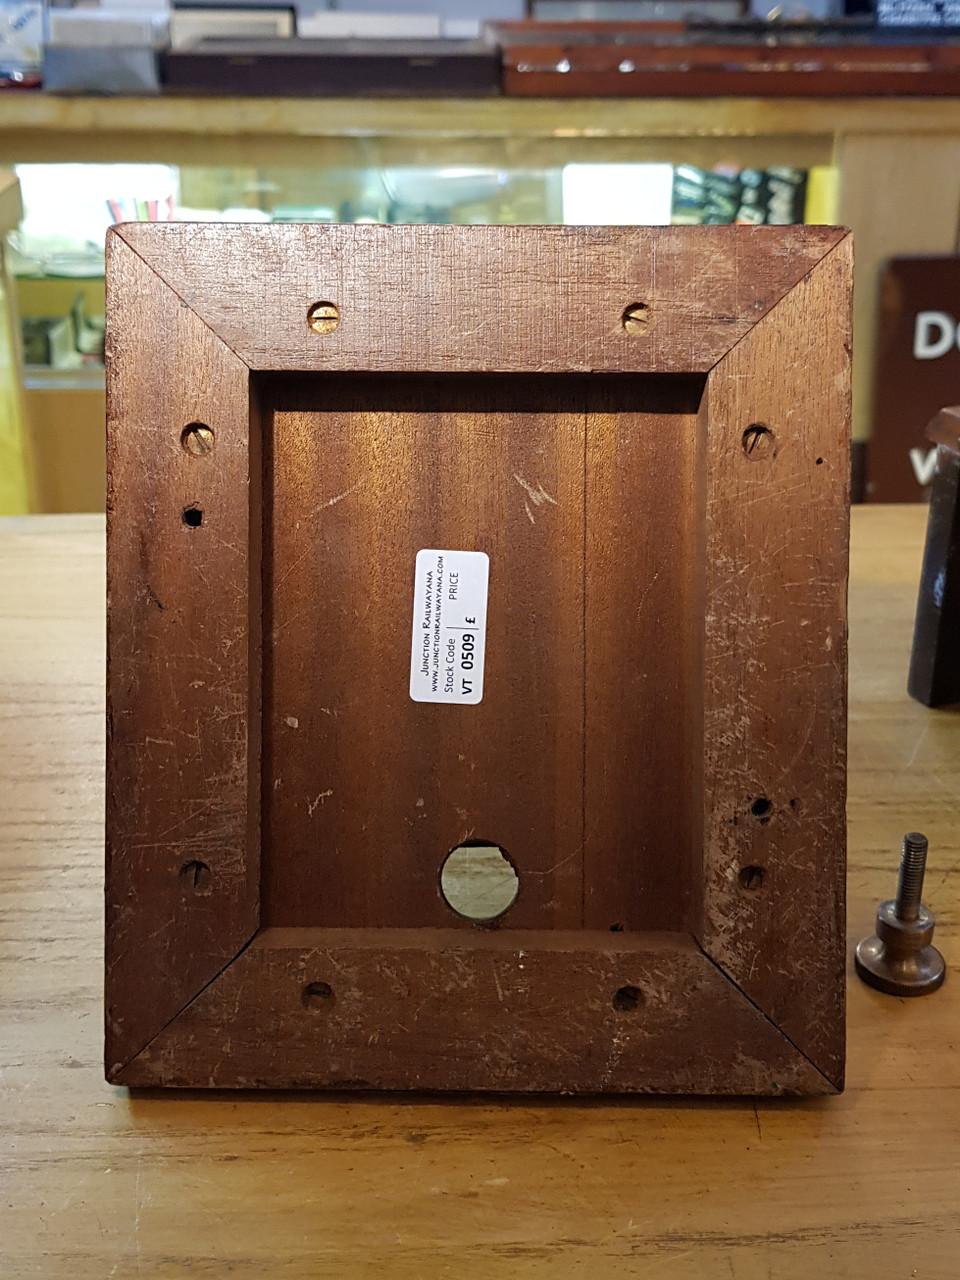 W R SYKES S.Rly SPLIT CASE SMALL BLOCK BELL. STOCK CODE VT 0509